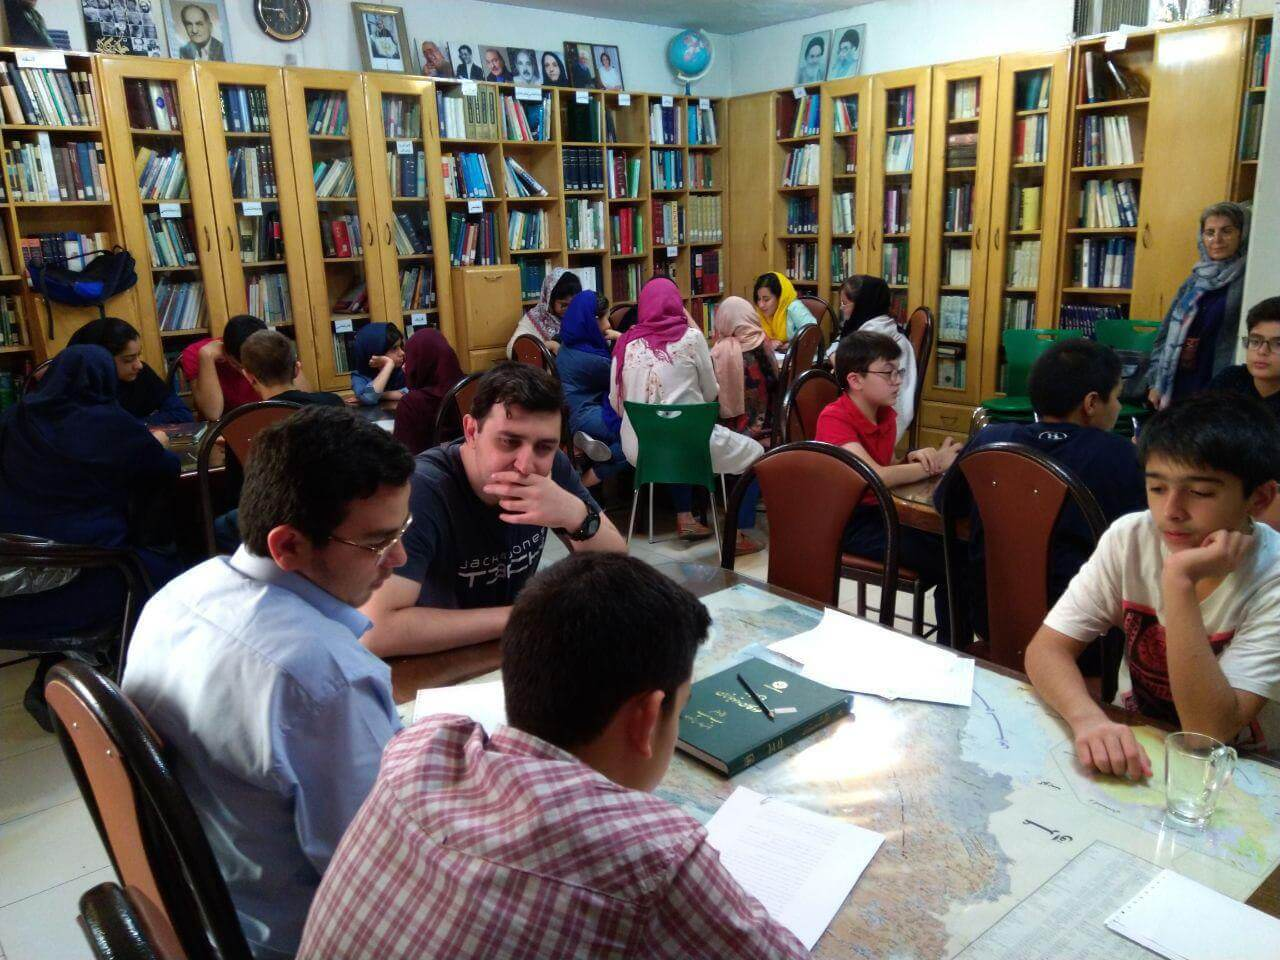 photo5830469253541770002 جلسه شورای مشورتى نوجوانان فرهنگنامه در تاريخ ١٦مهرماه ١٣٩٨